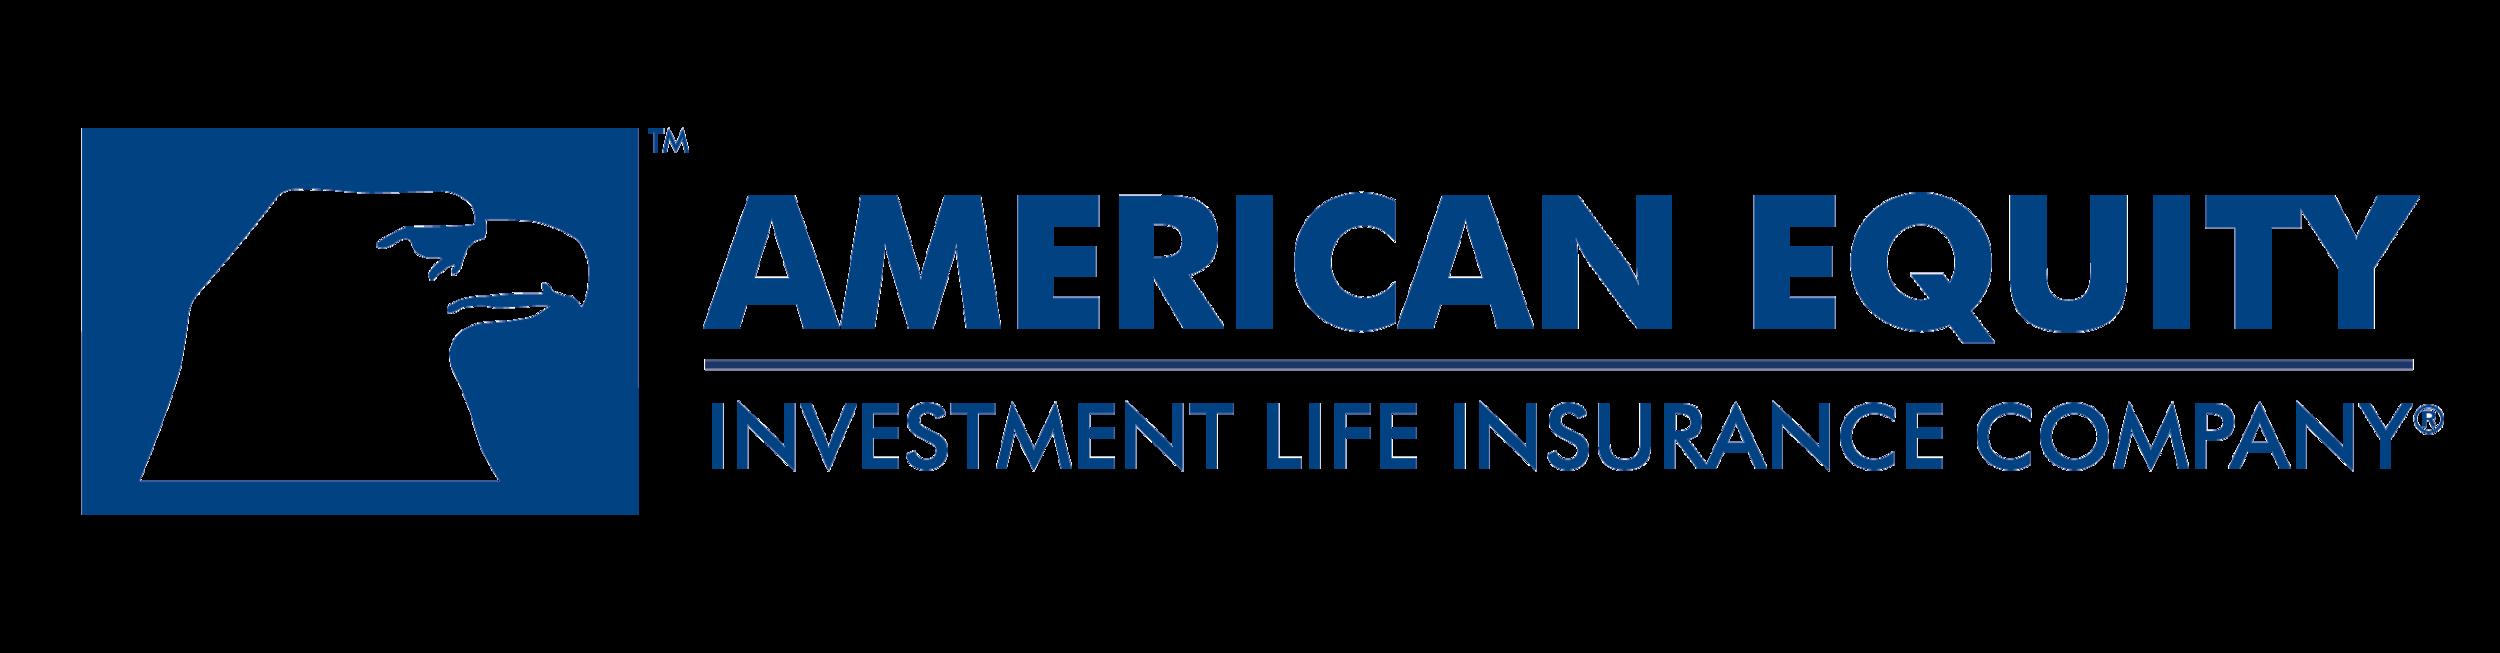 american-equity-impact-iowa-sponsor-2019